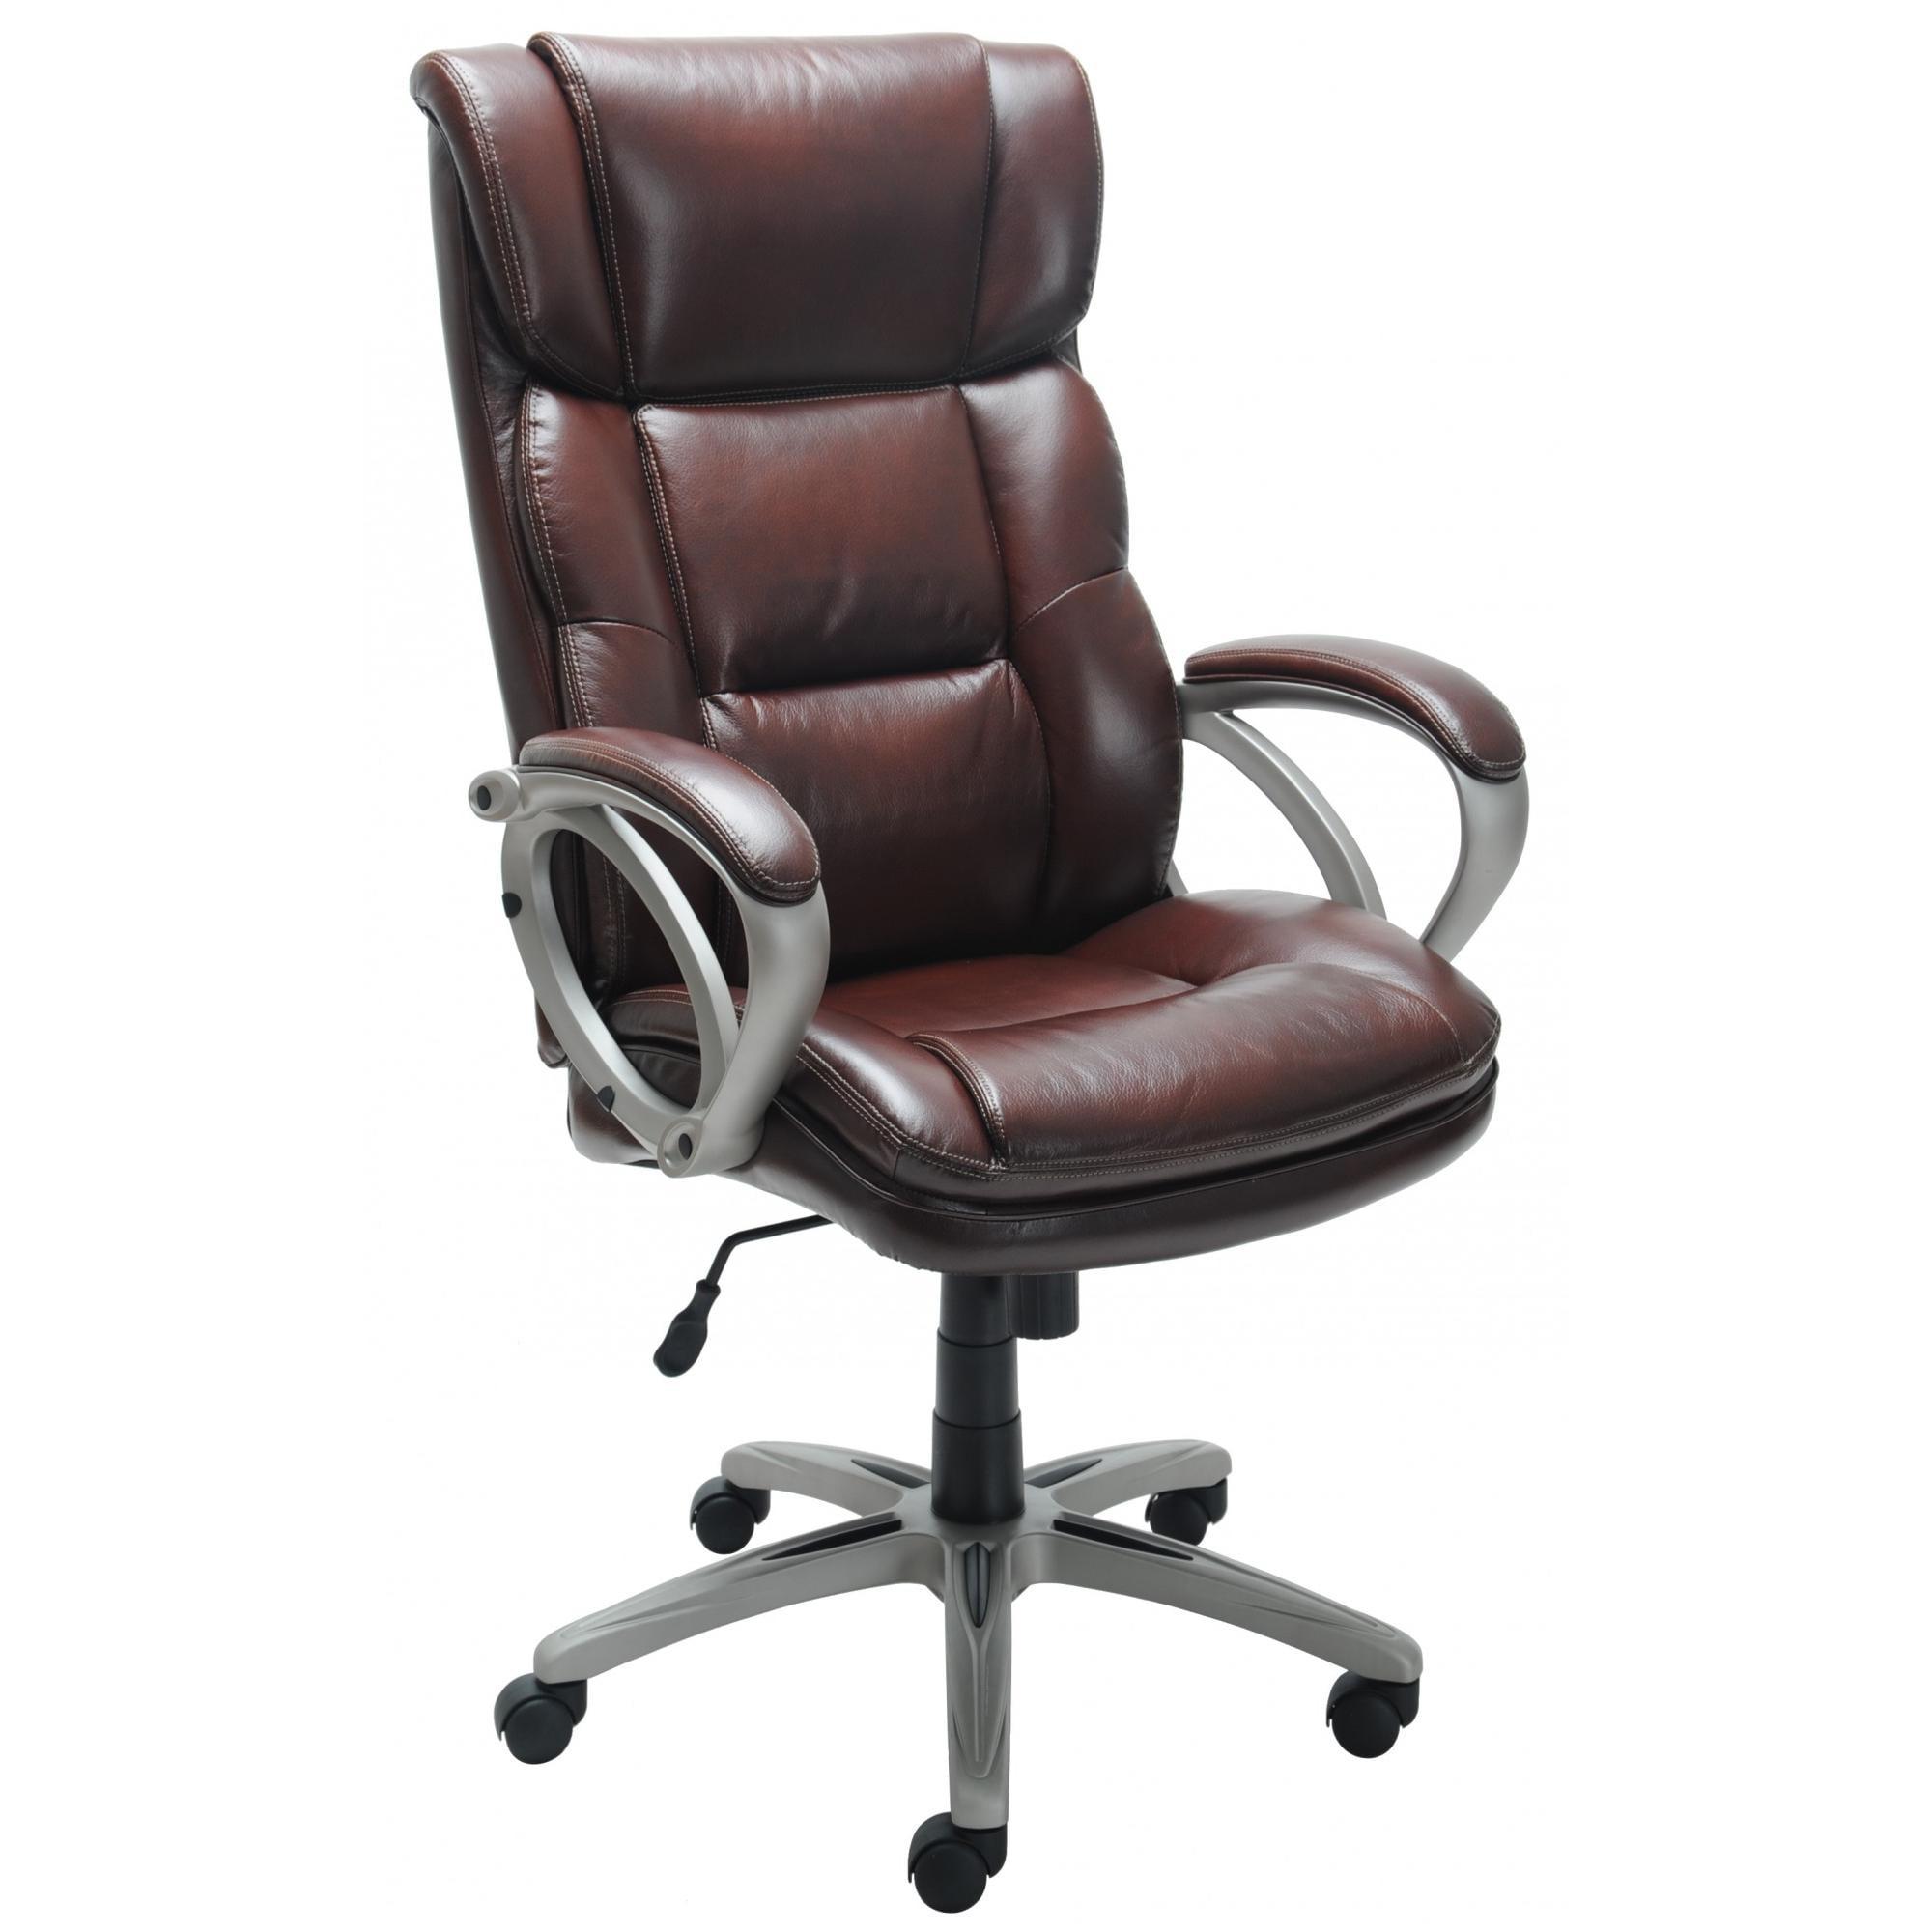 broyhill bonded leather executive chair - walmart